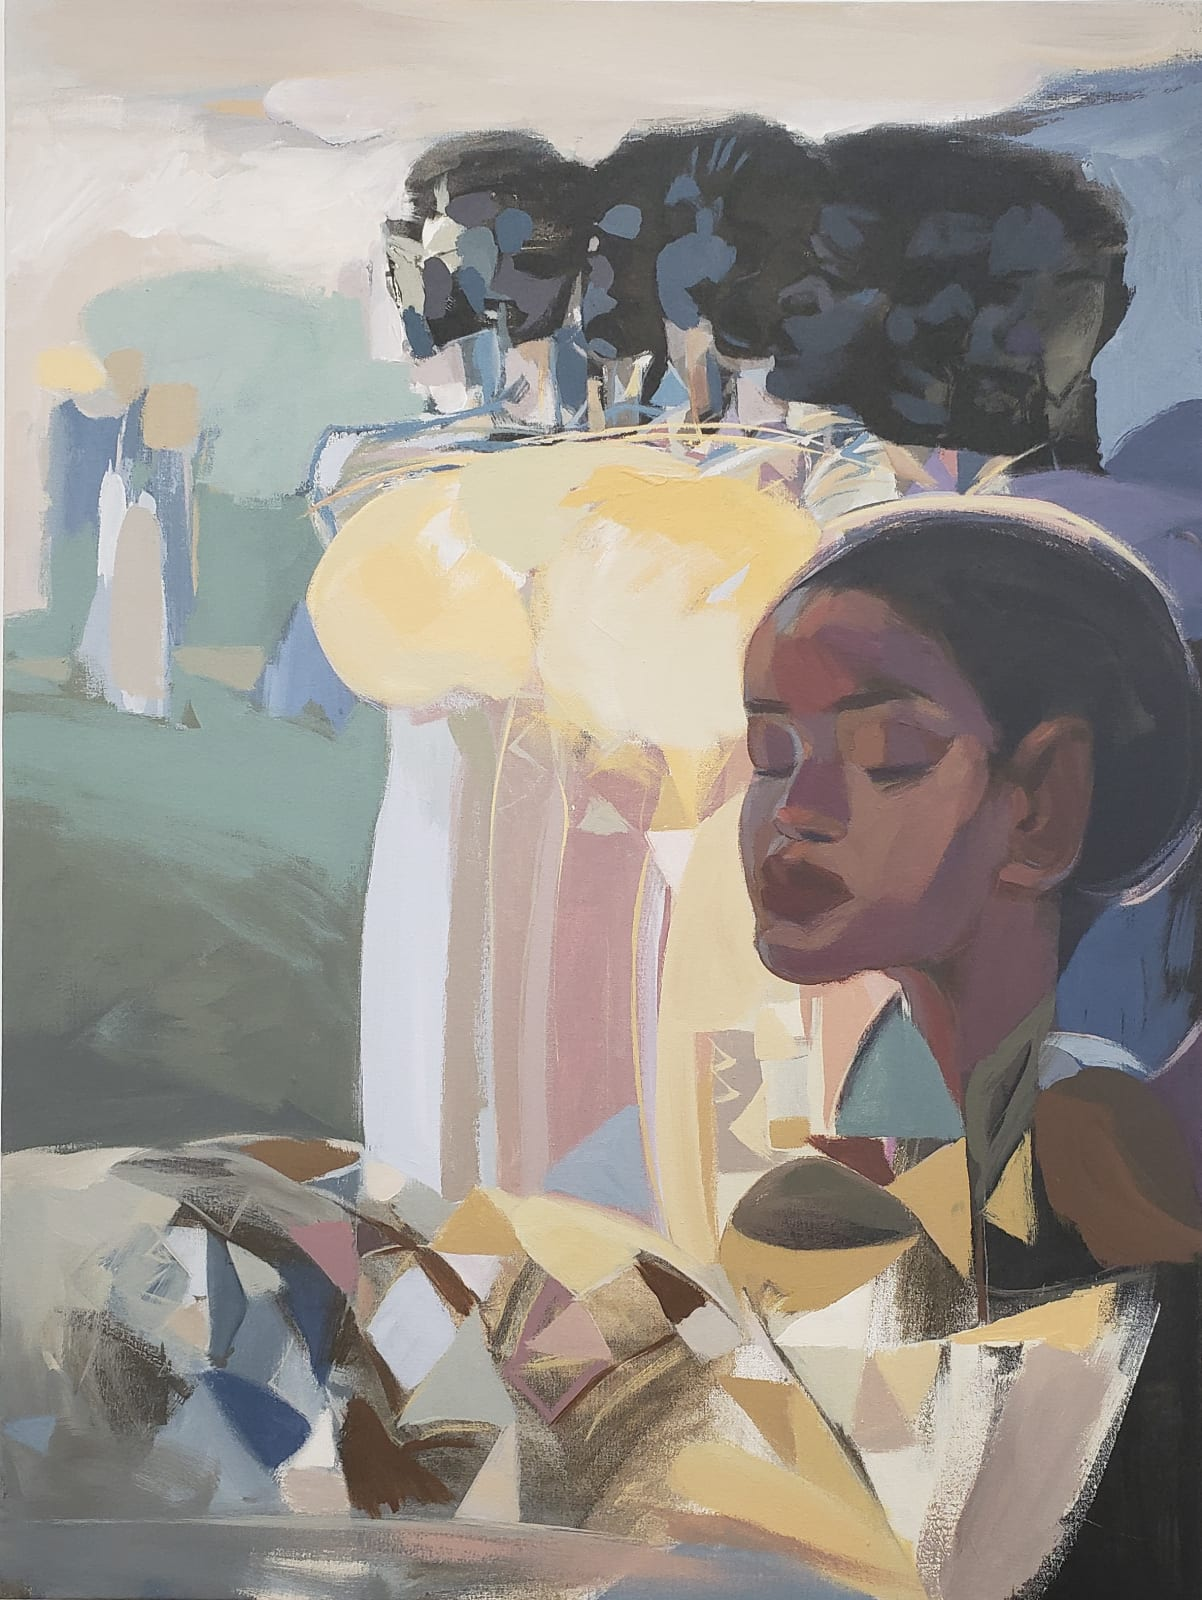 Dereje Demissie, Floating Memories 5, 2021